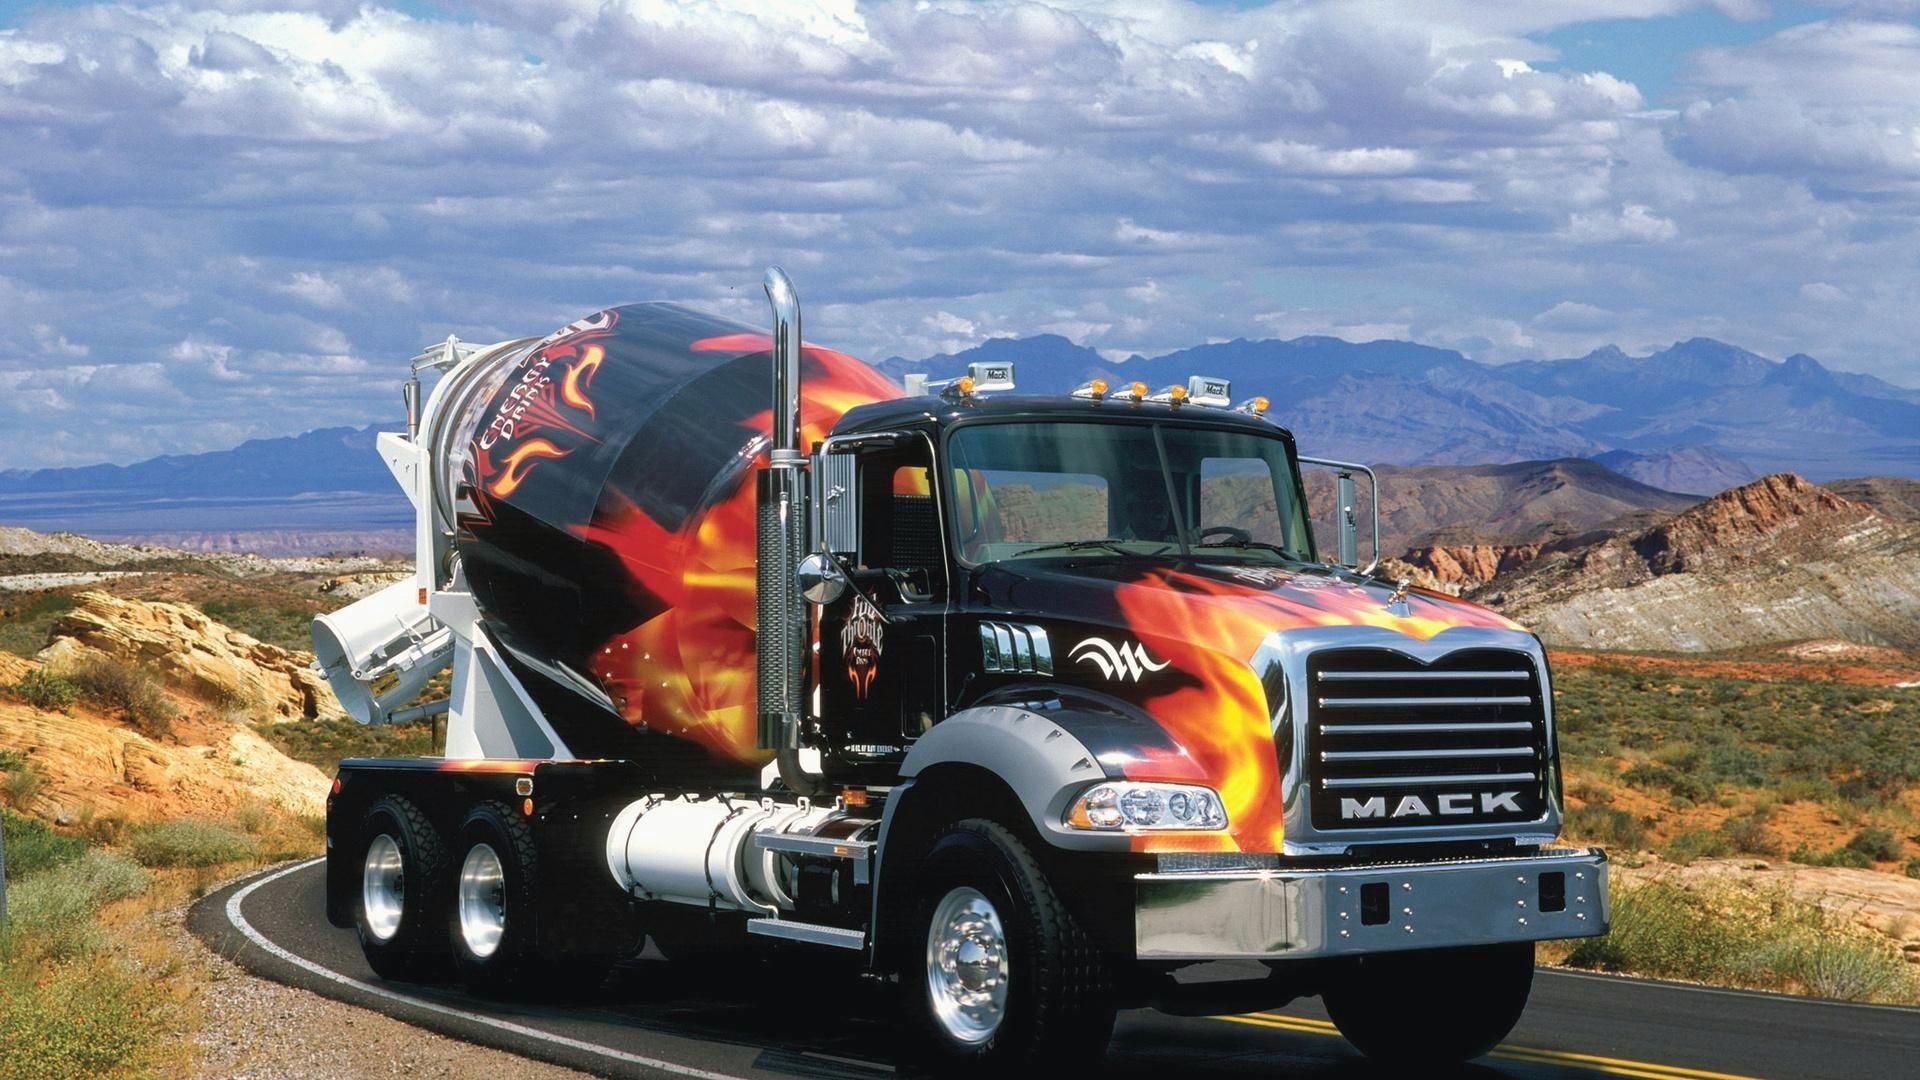 Mack Trucks Wallpapers Wallpaper Cave Mack Trucks Cool Trucks Trucks Dump truck wallpapers cars wallpapers hd